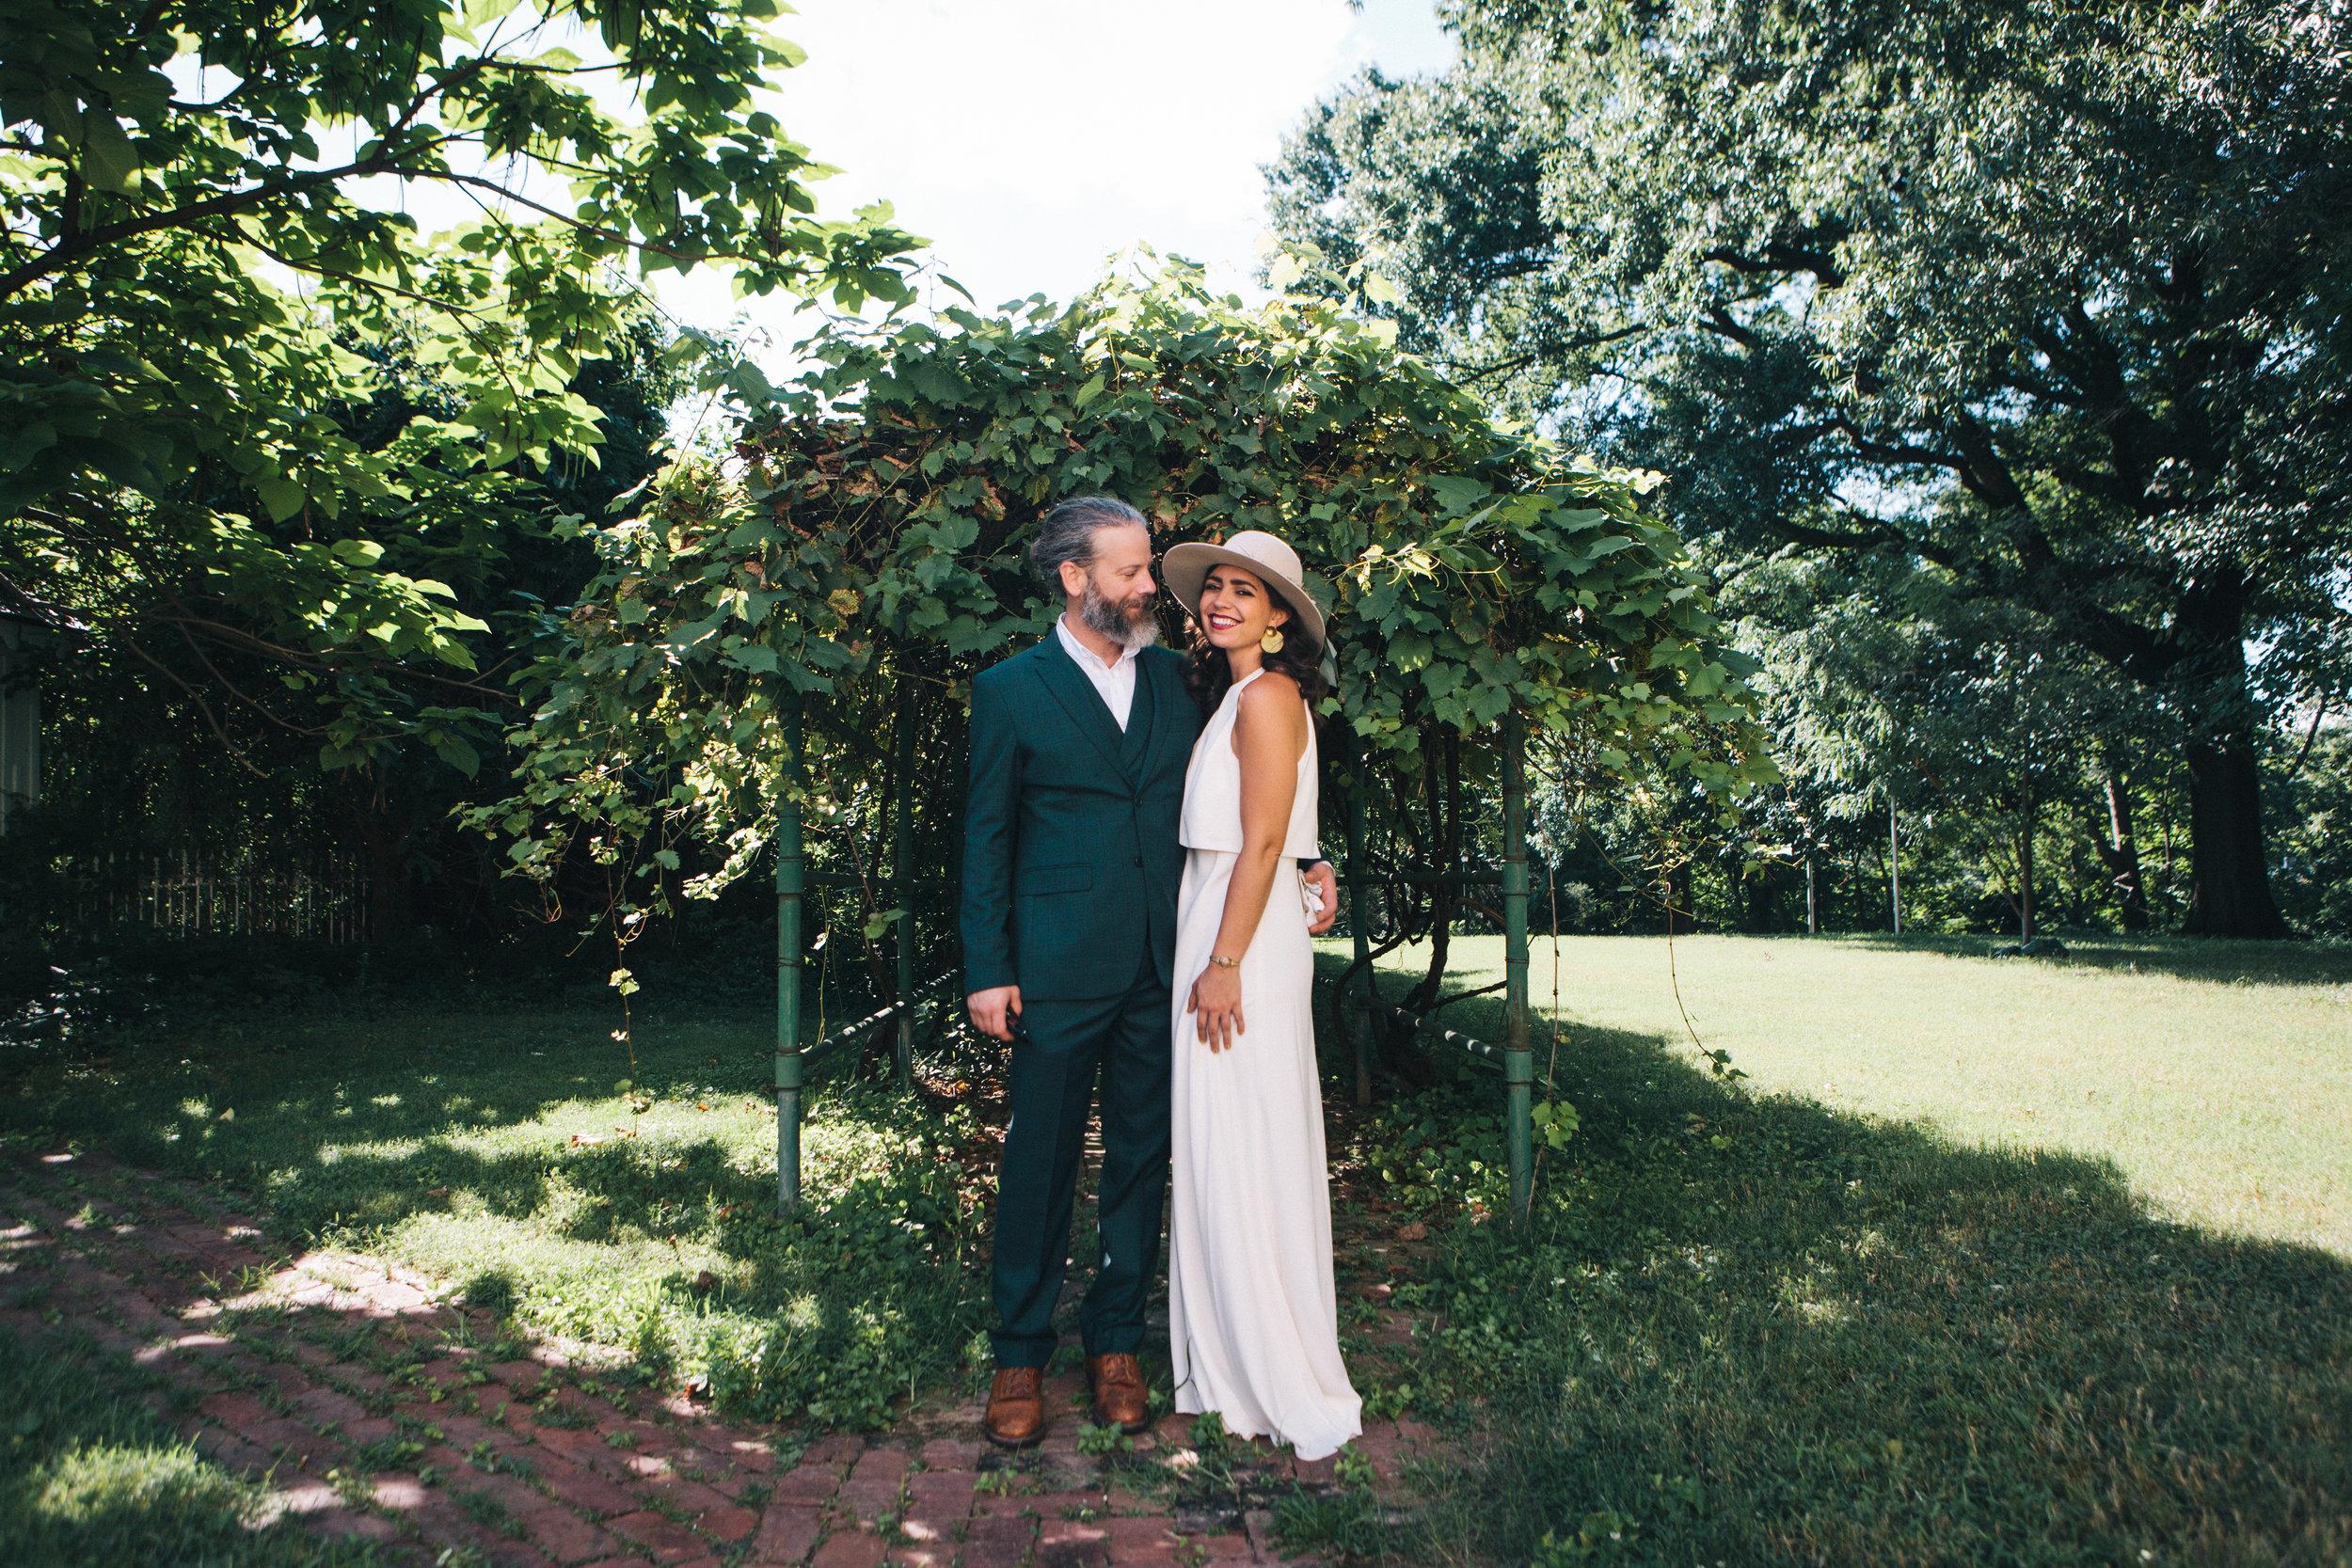 Harlan_LeeHart_Wedding-54.jpg